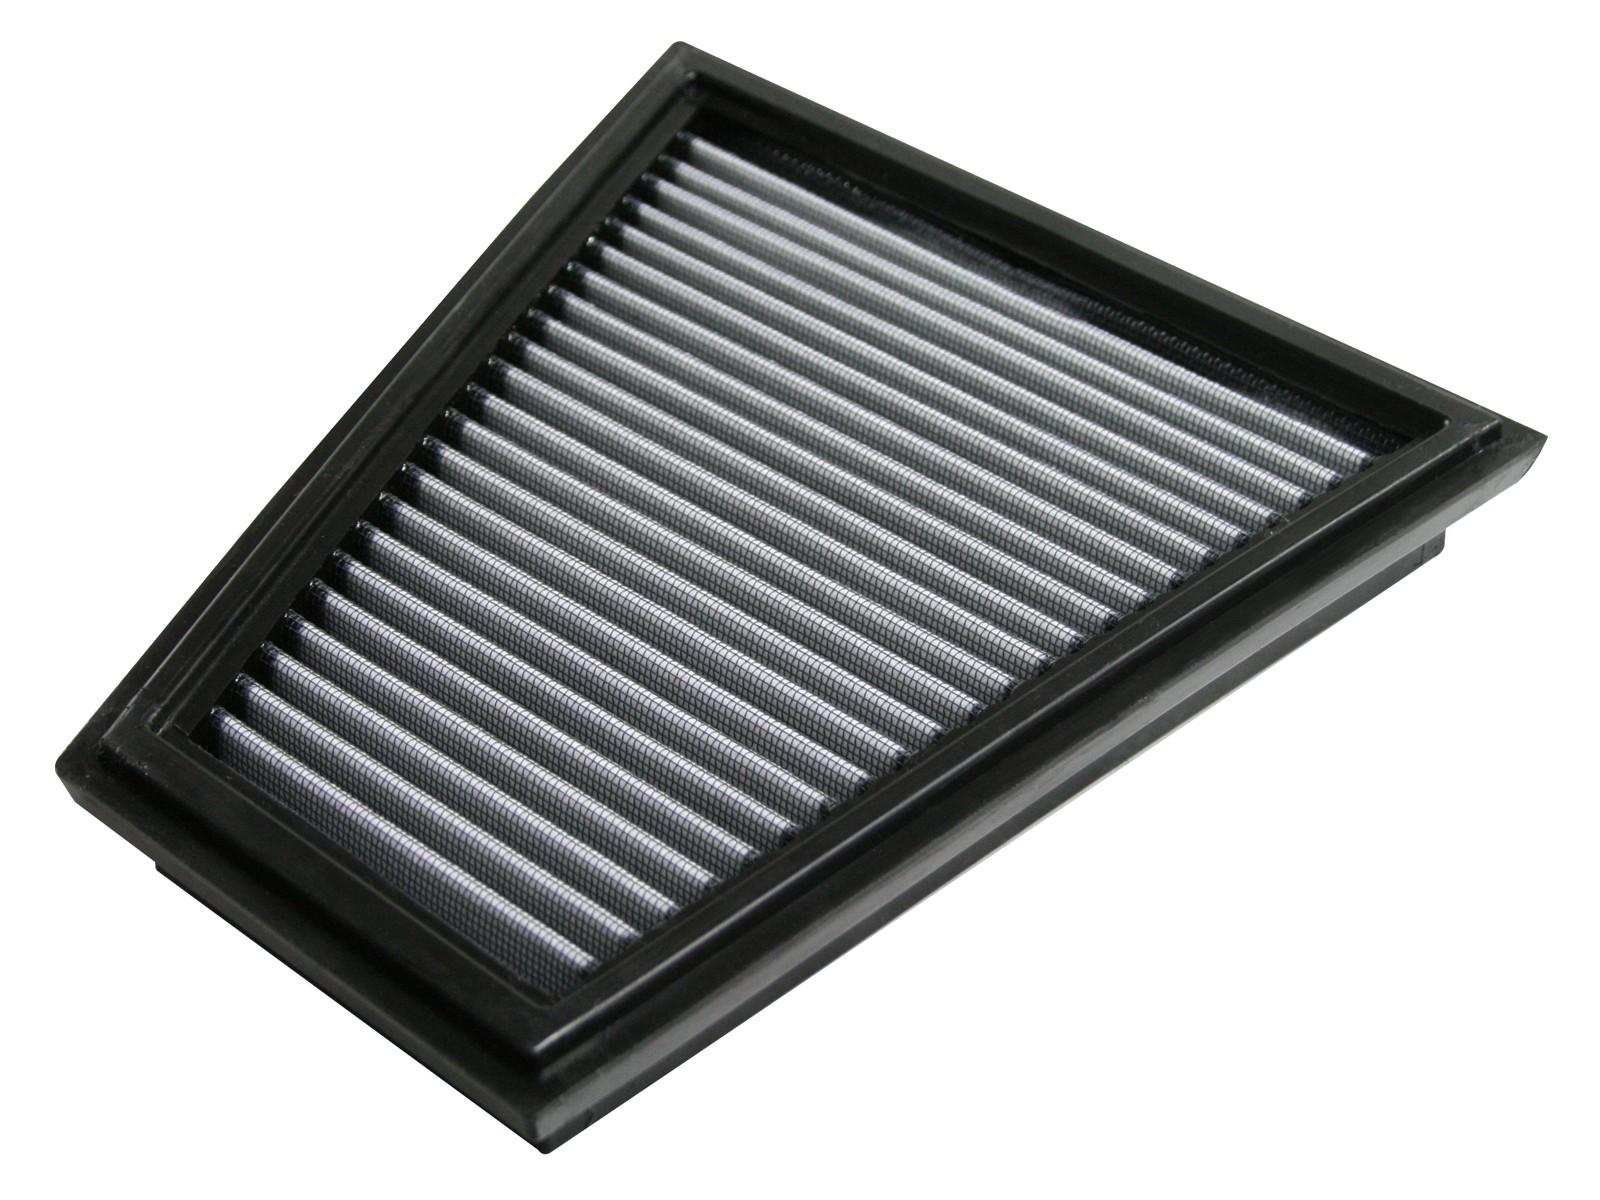 aFe POWER 31-10227 Magnum FLOW Pro DRY S Air Filter